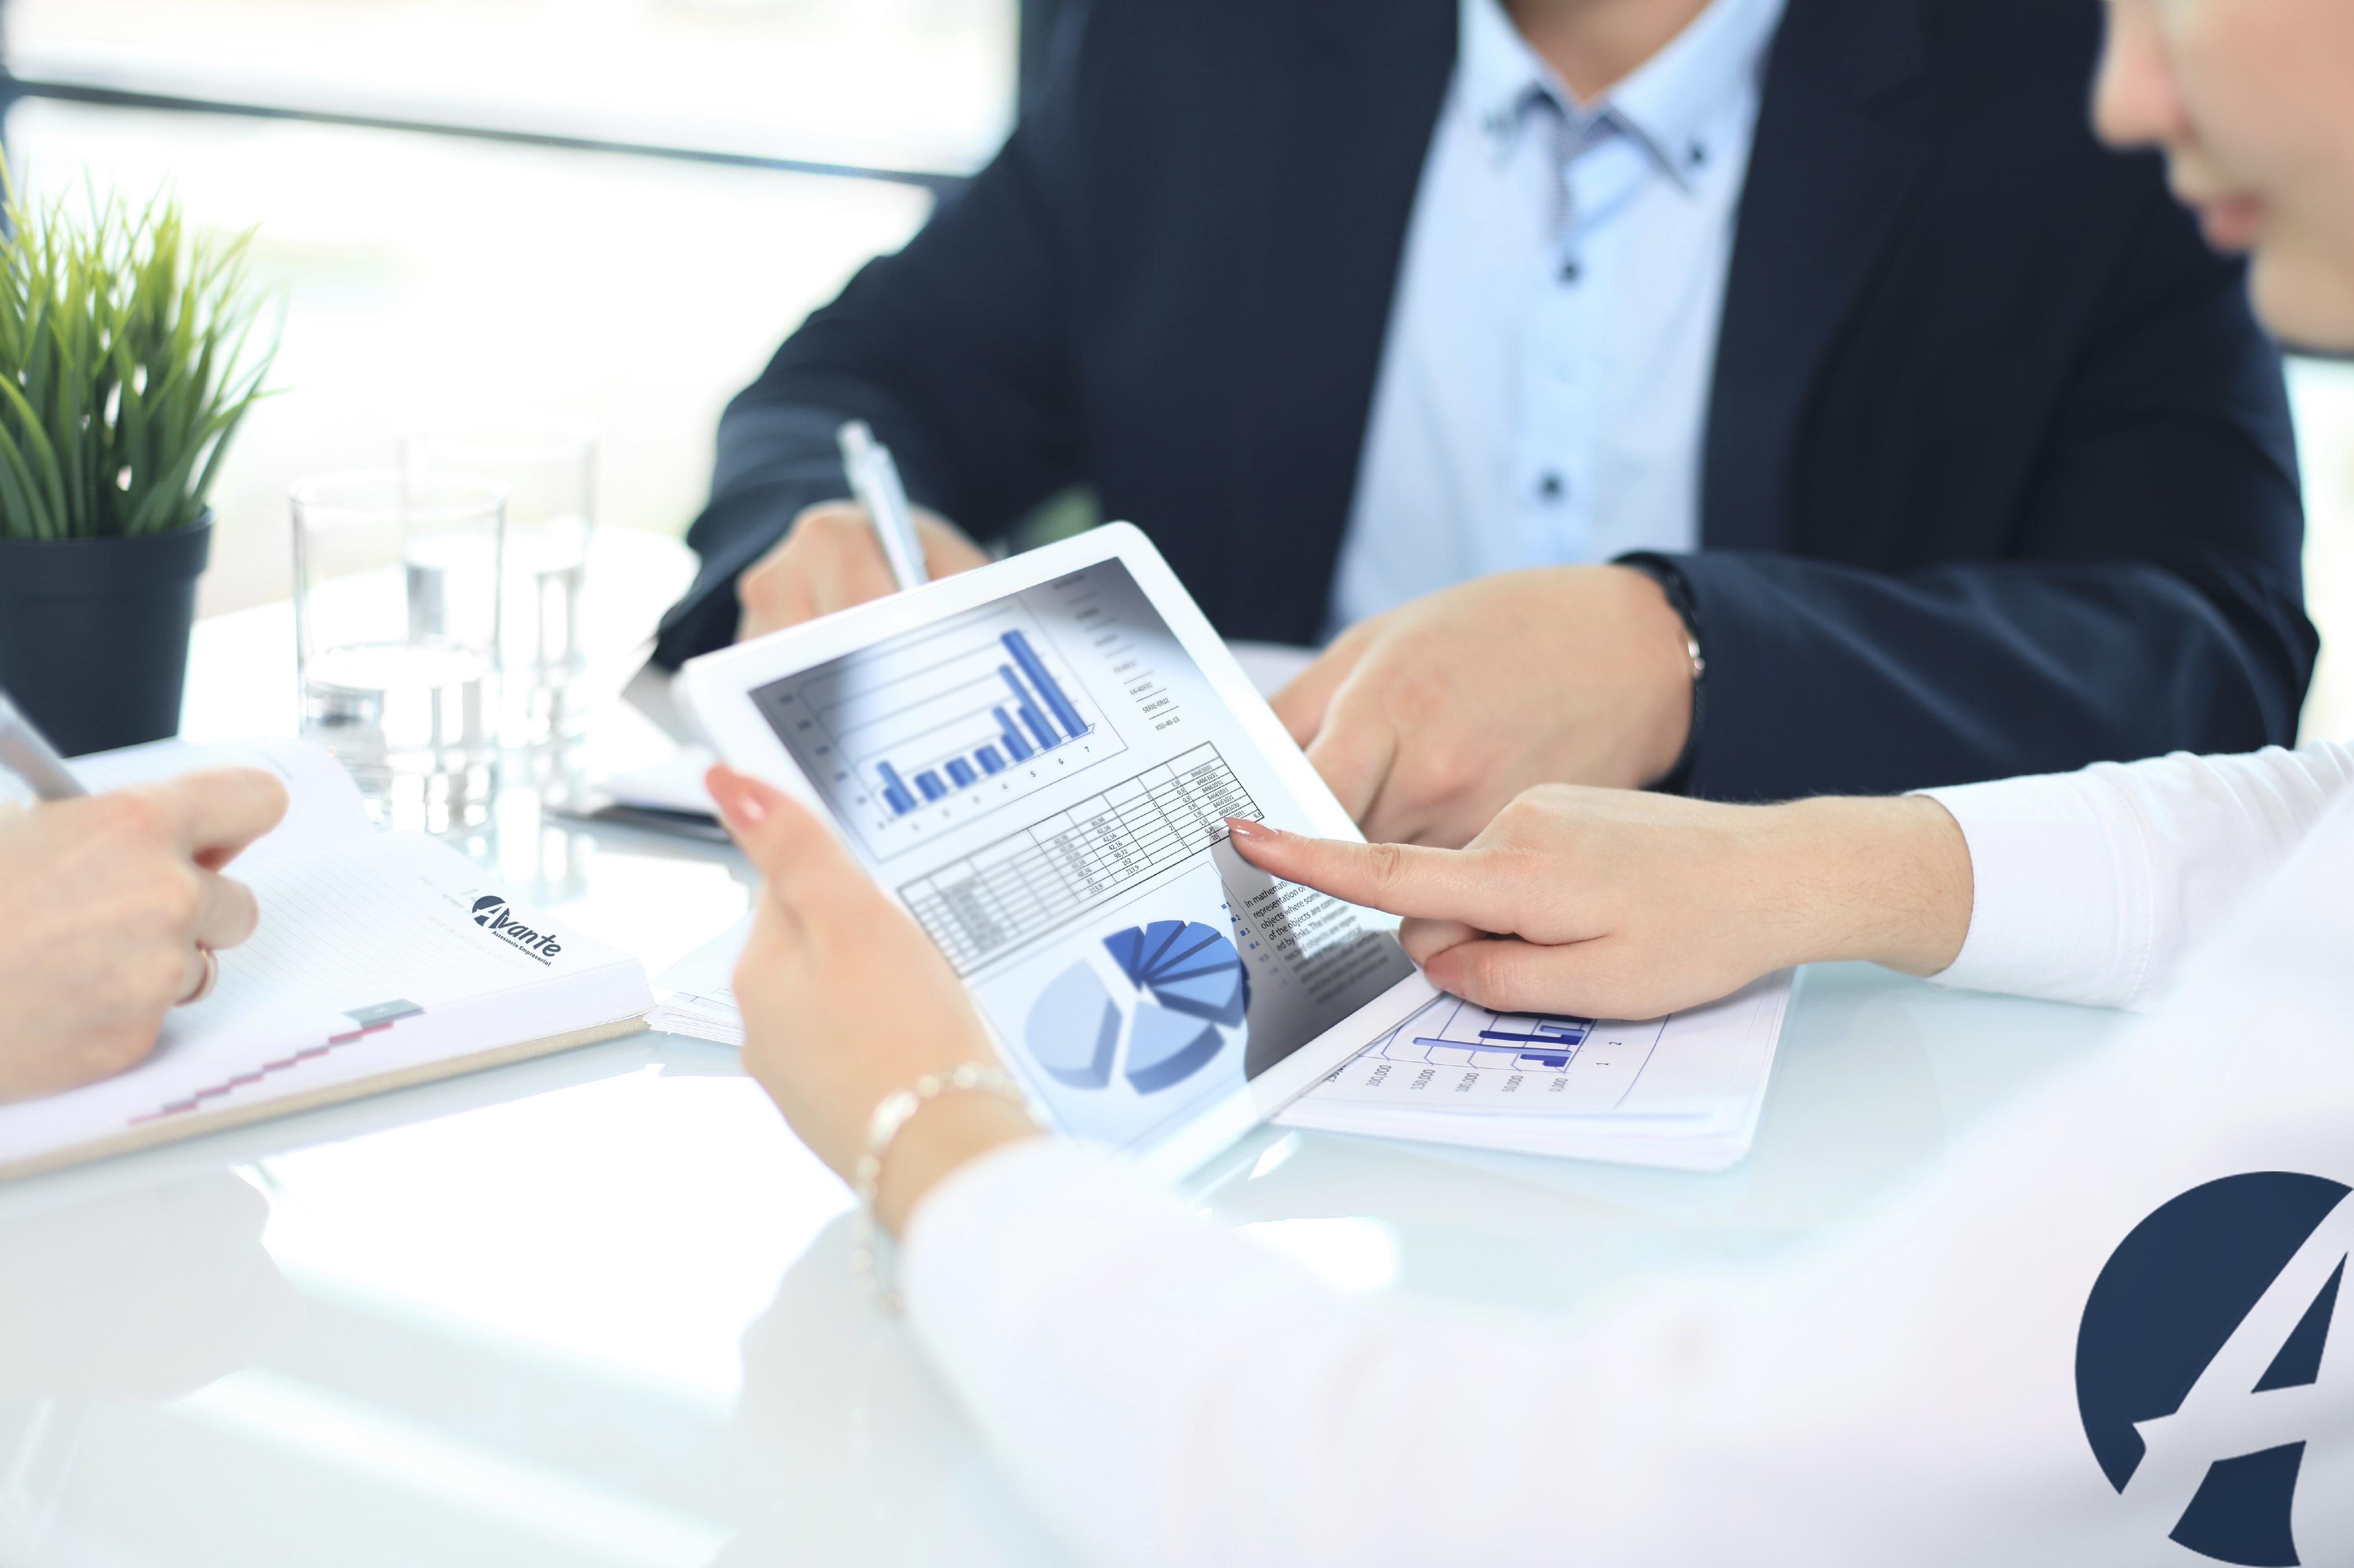 assessoria-empresarial-para-reestruturacao-empresarial